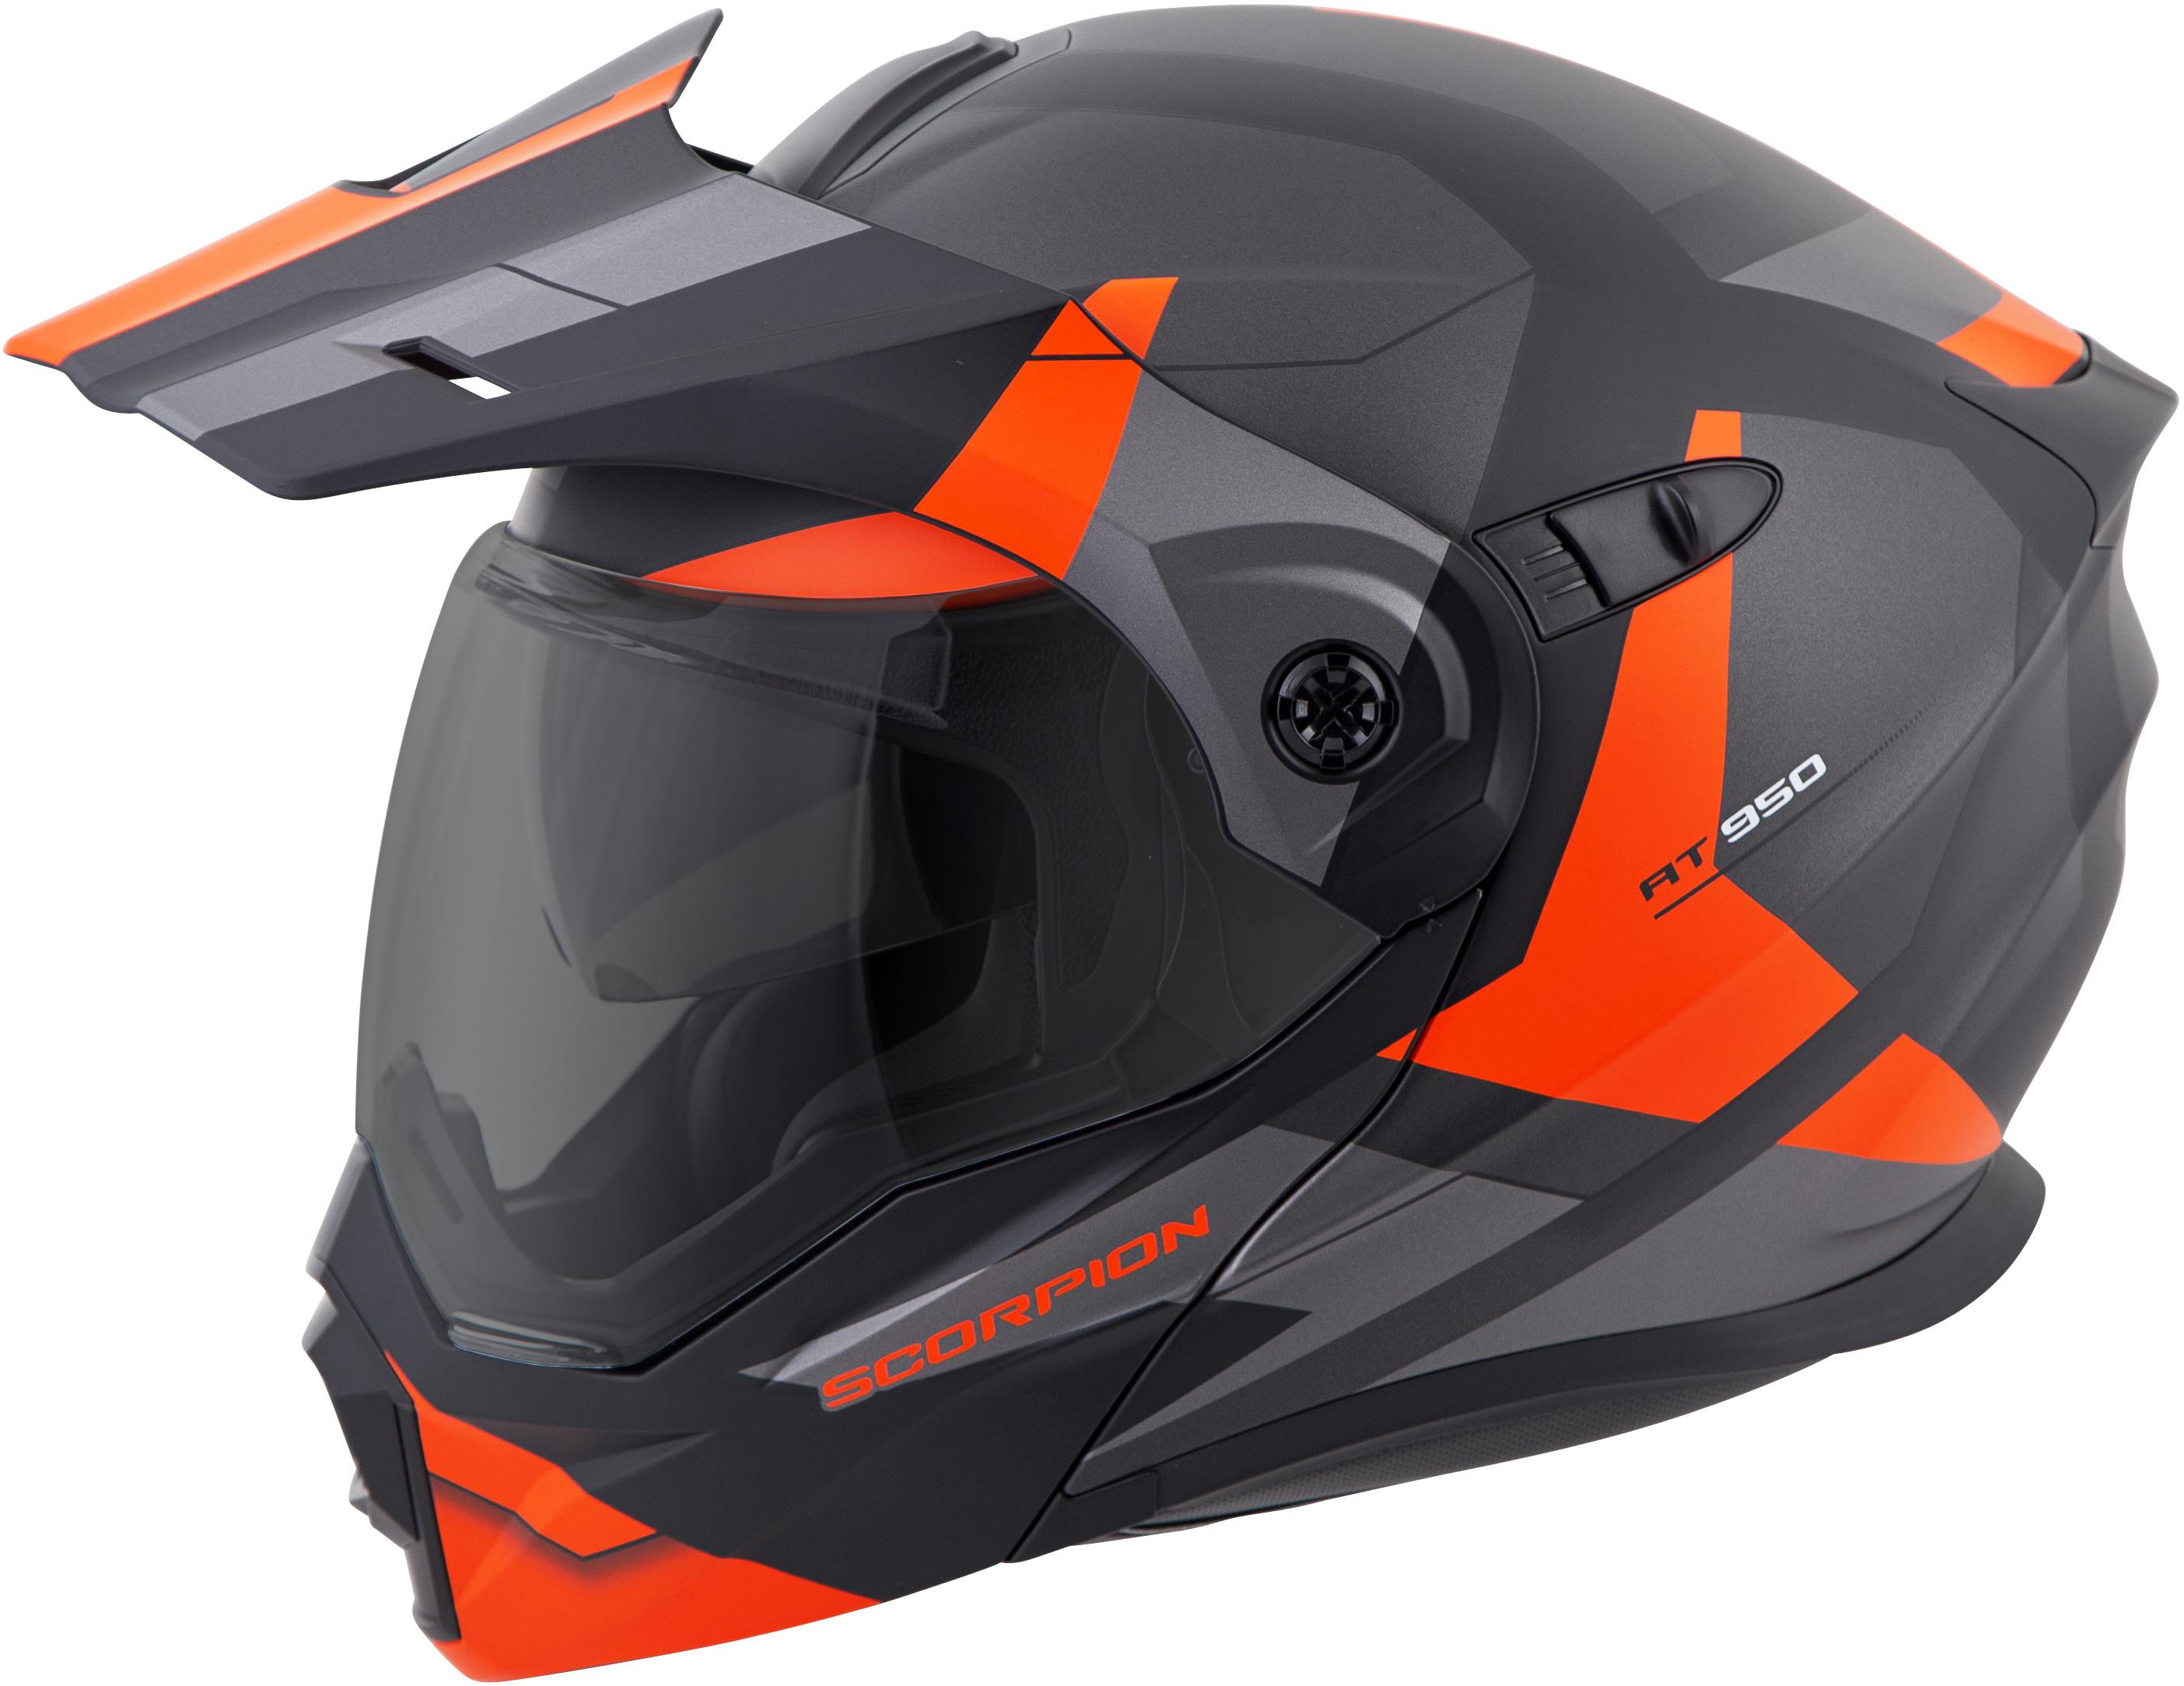 for-Scorpion-Helmet-EXO-AT950-Neocon-Snow-Helmet-with-Dual-Lens-Shield miniature 17